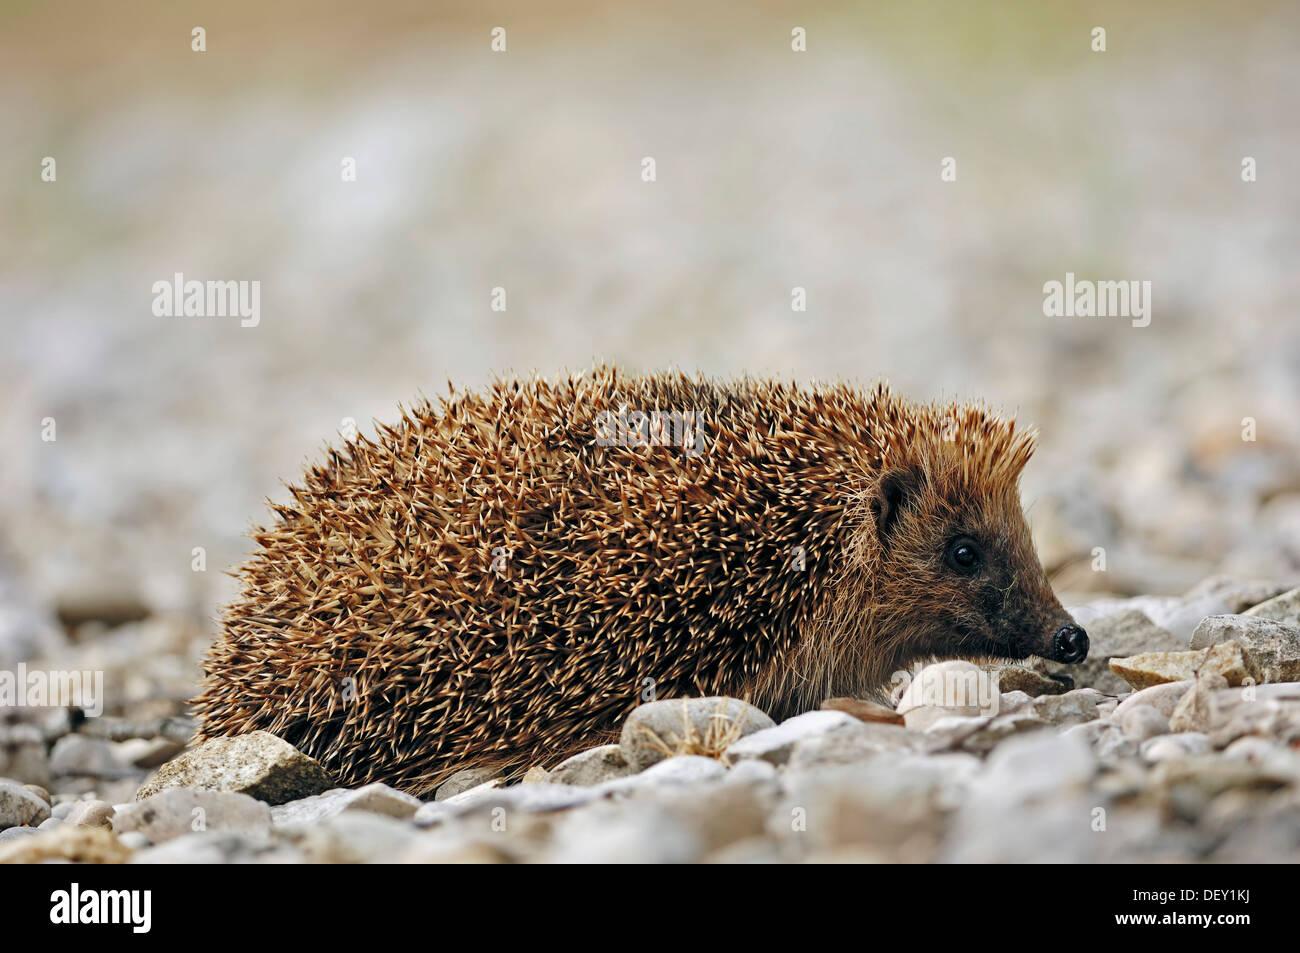 European Hedgehog (Erinaceus europaeus), France, Europe Stock Photo